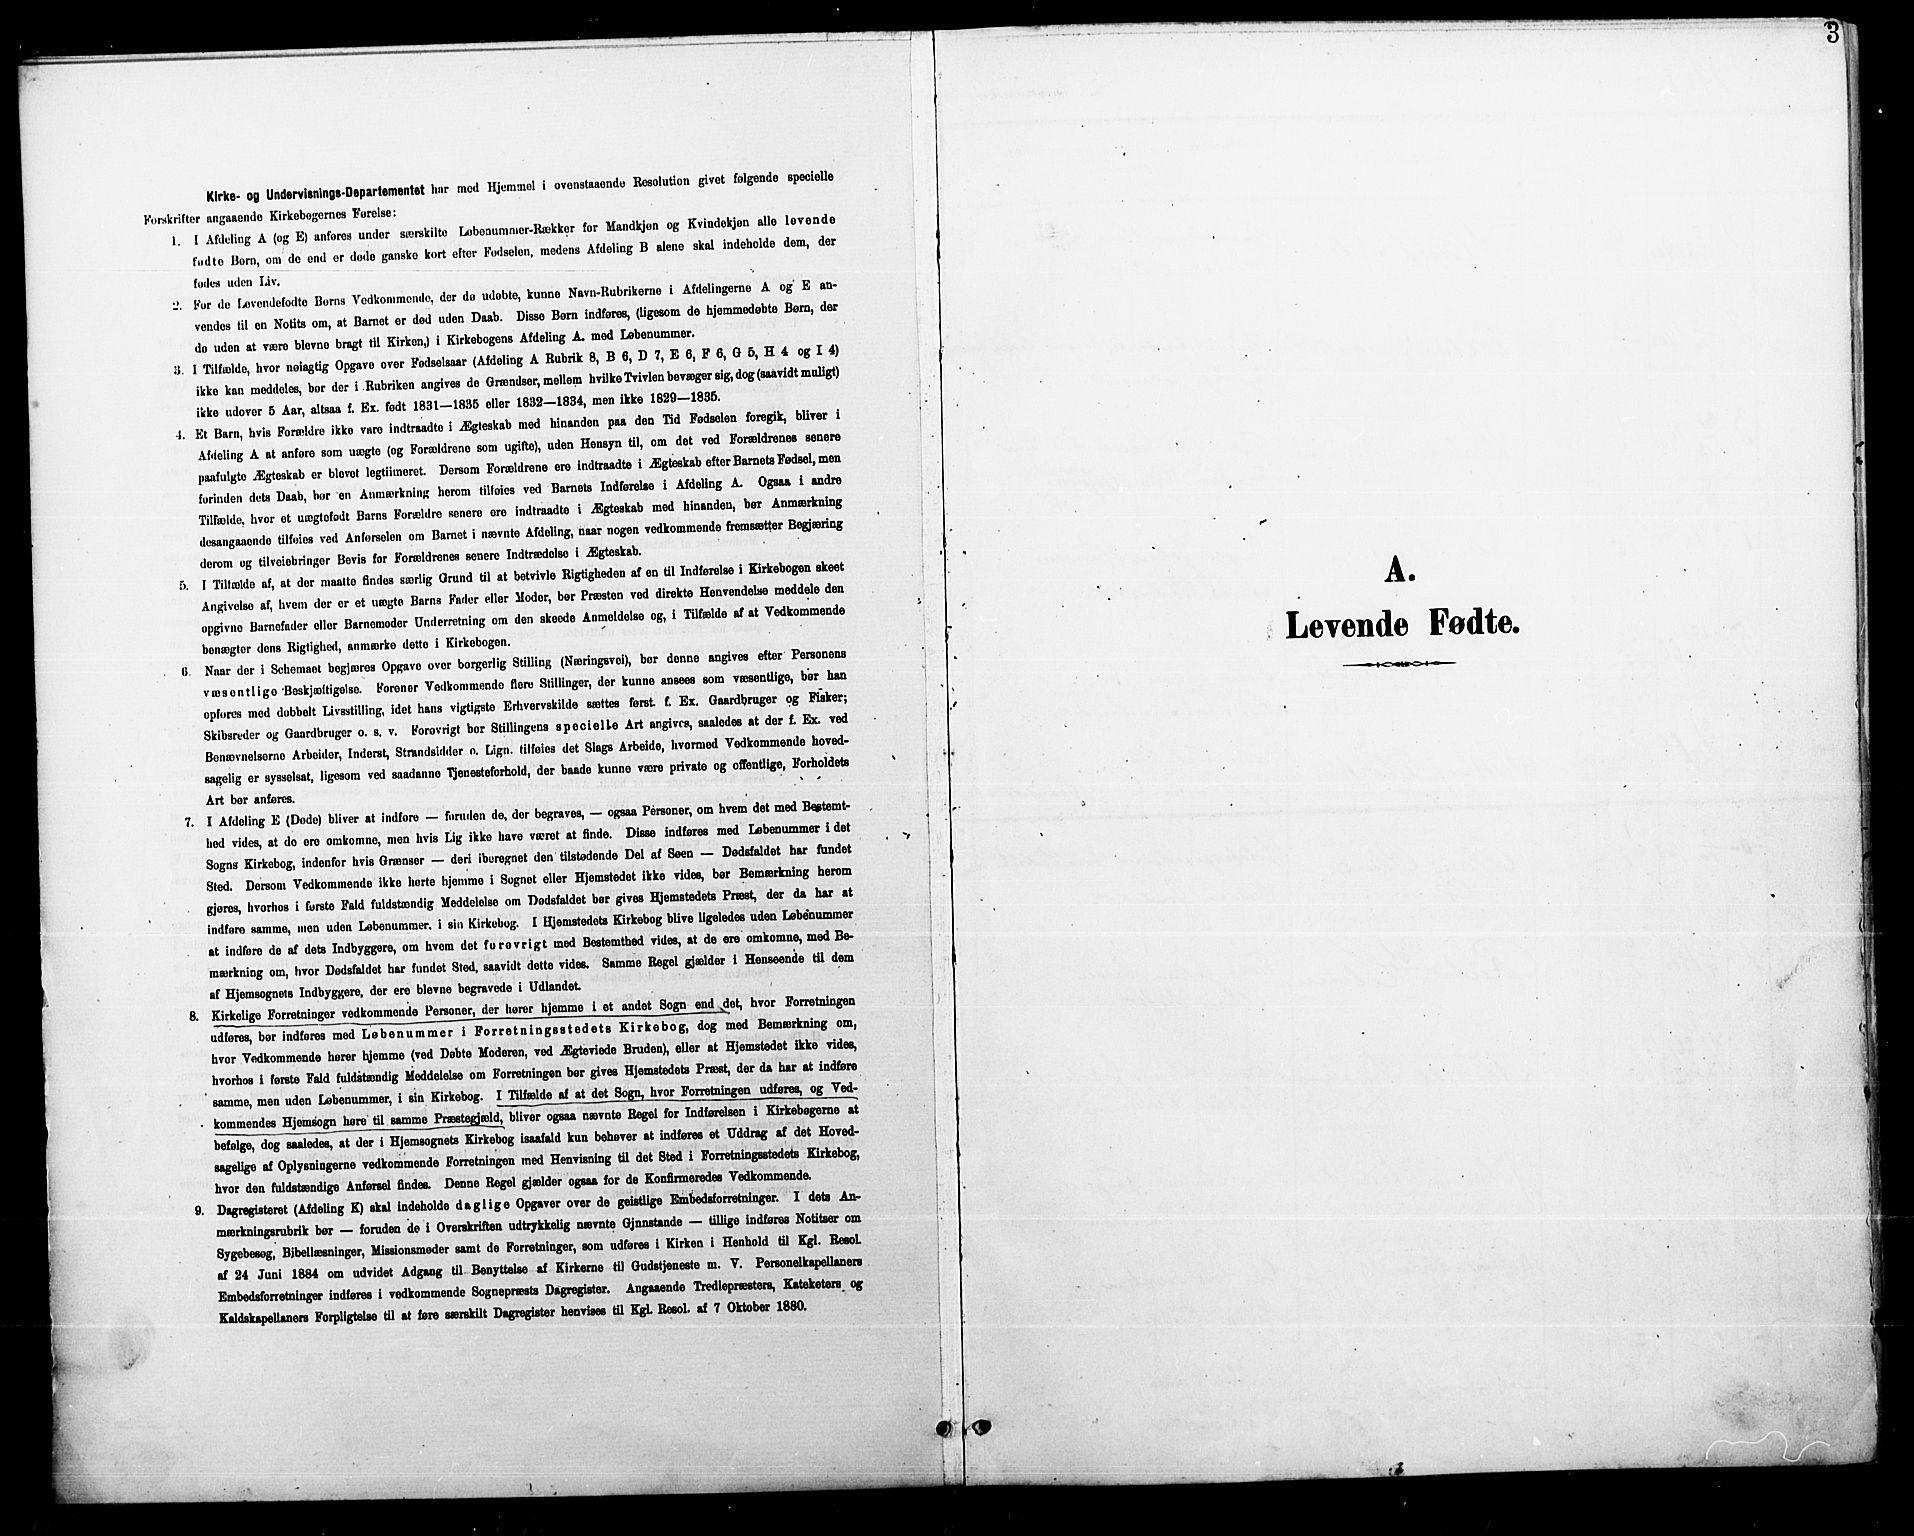 SAT, Ministerialprotokoller, klokkerbøker og fødselsregistre - Nordland, 804/L0088: Klokkerbok nr. 804C01, 1901-1917, s. 3